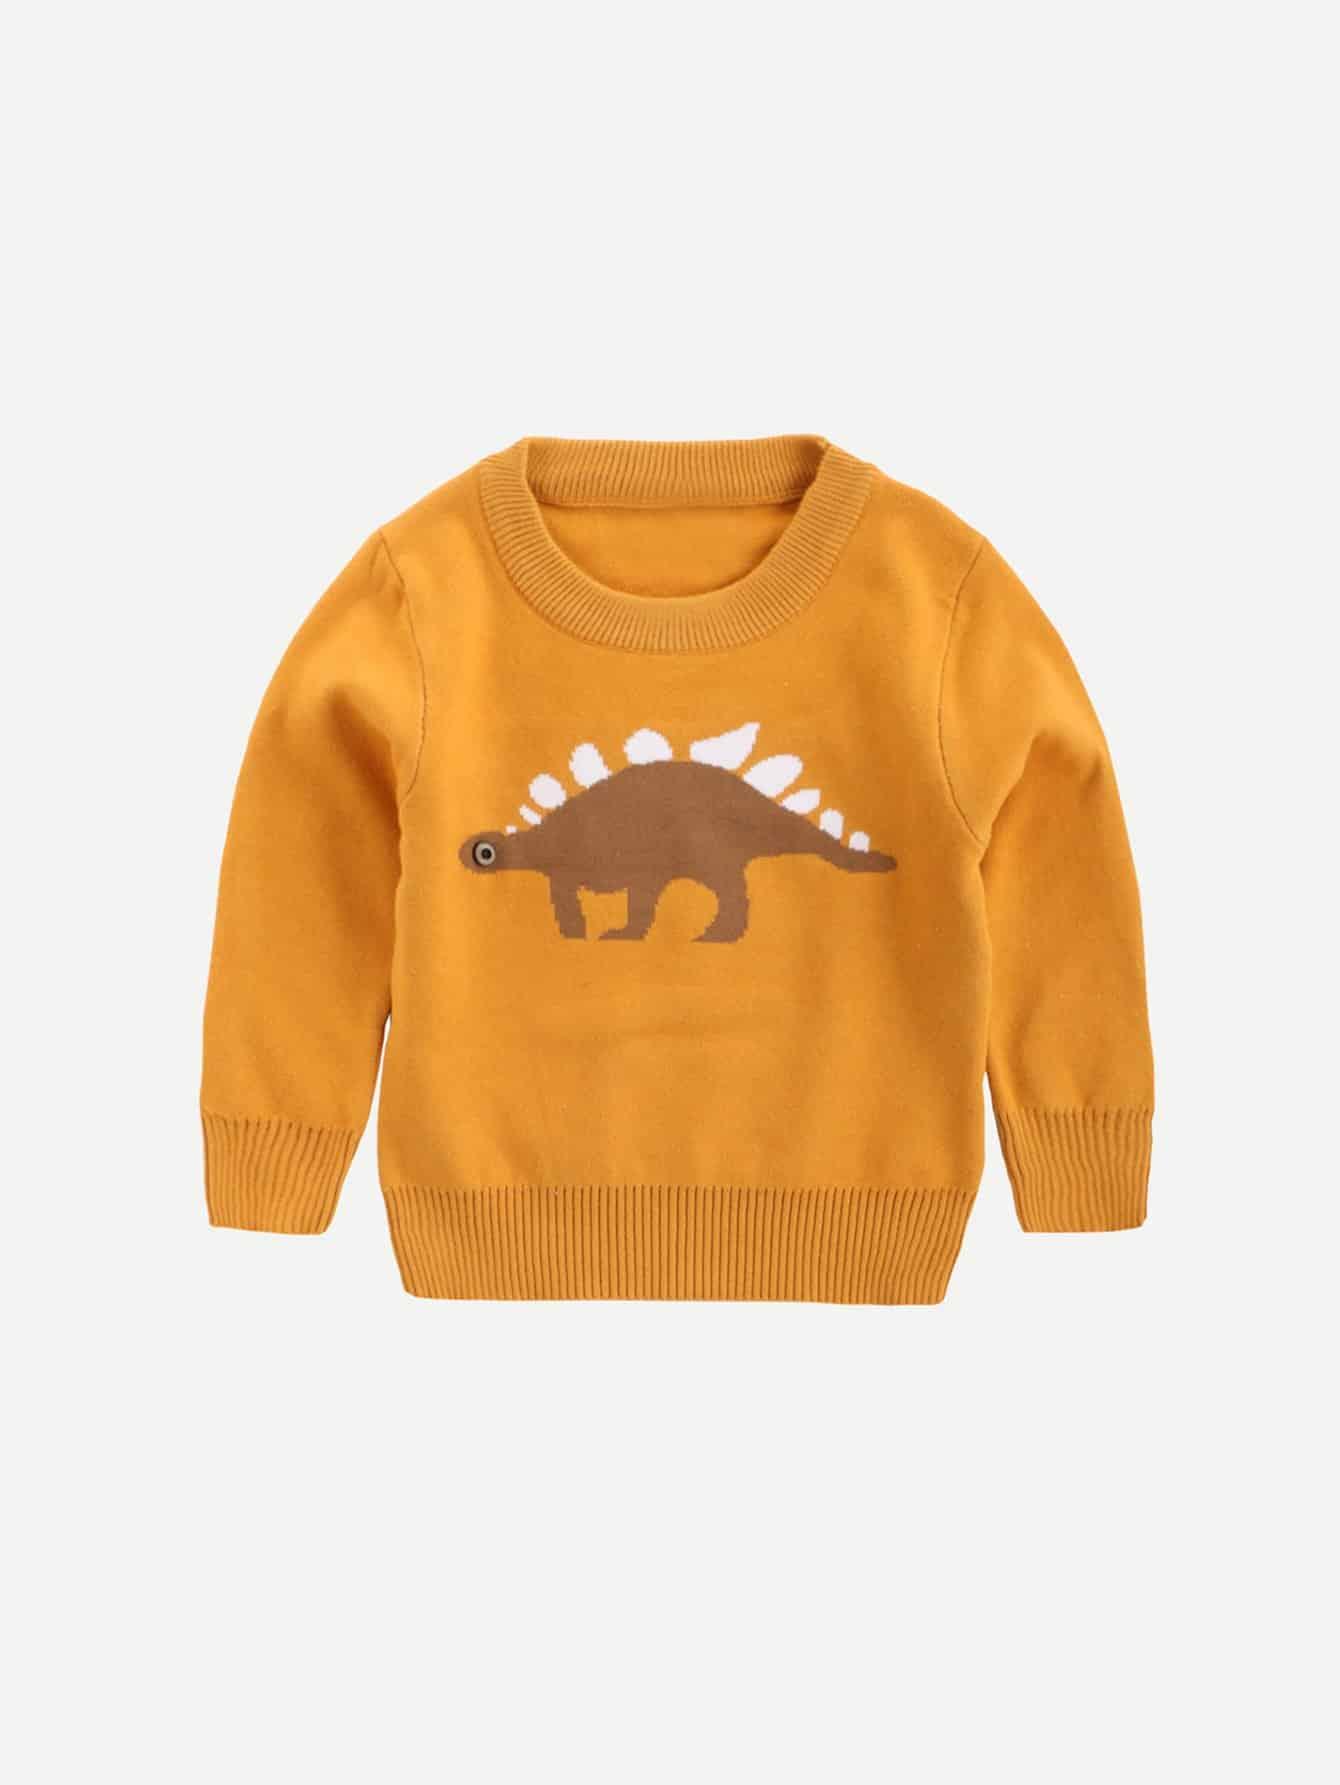 Boys Dinosaur Print Sweater